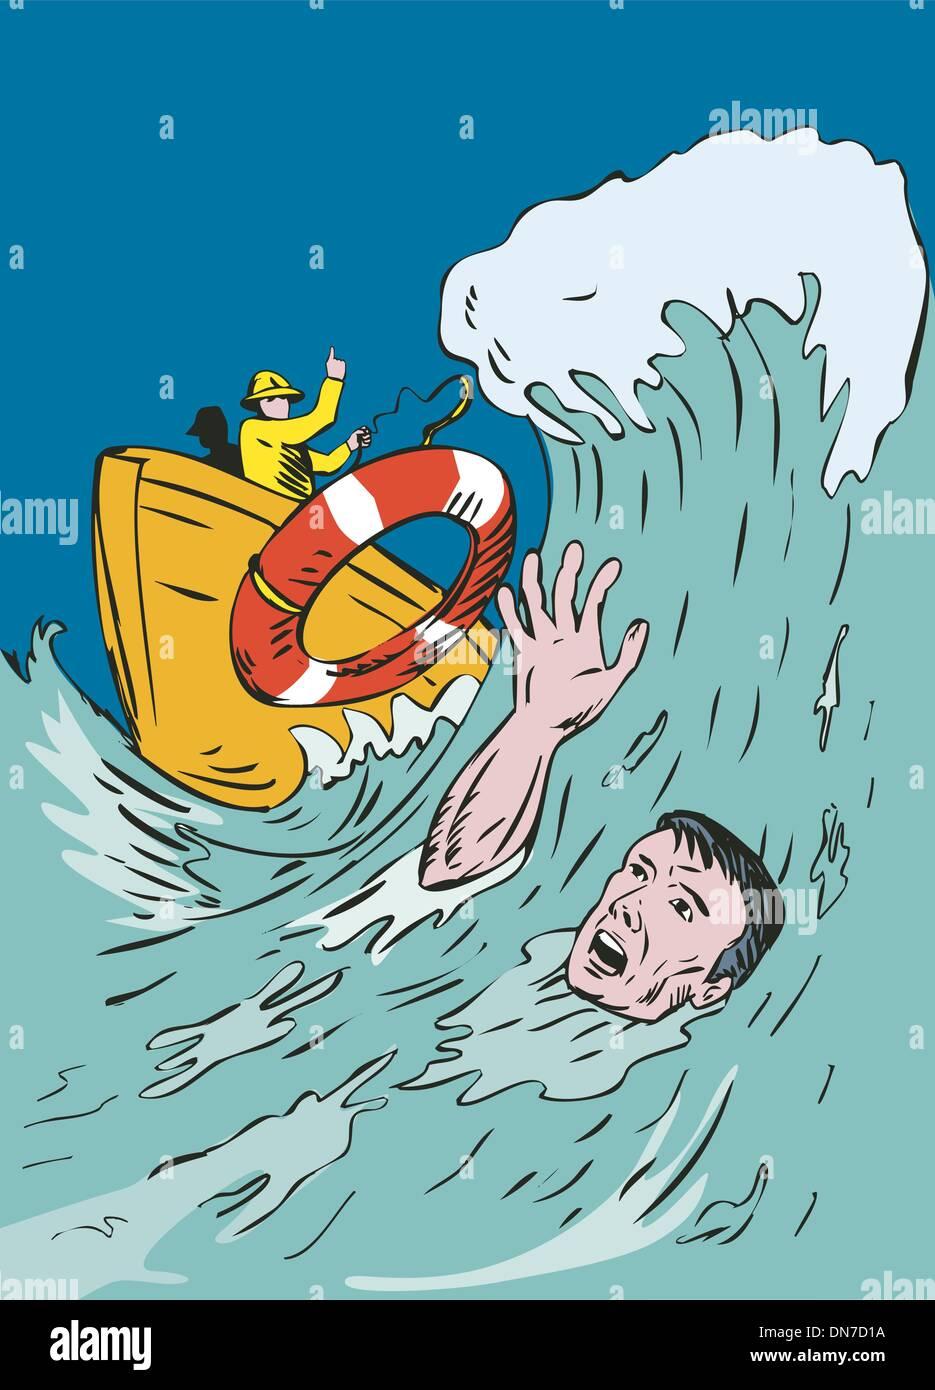 Man Drowning - Stock Vector